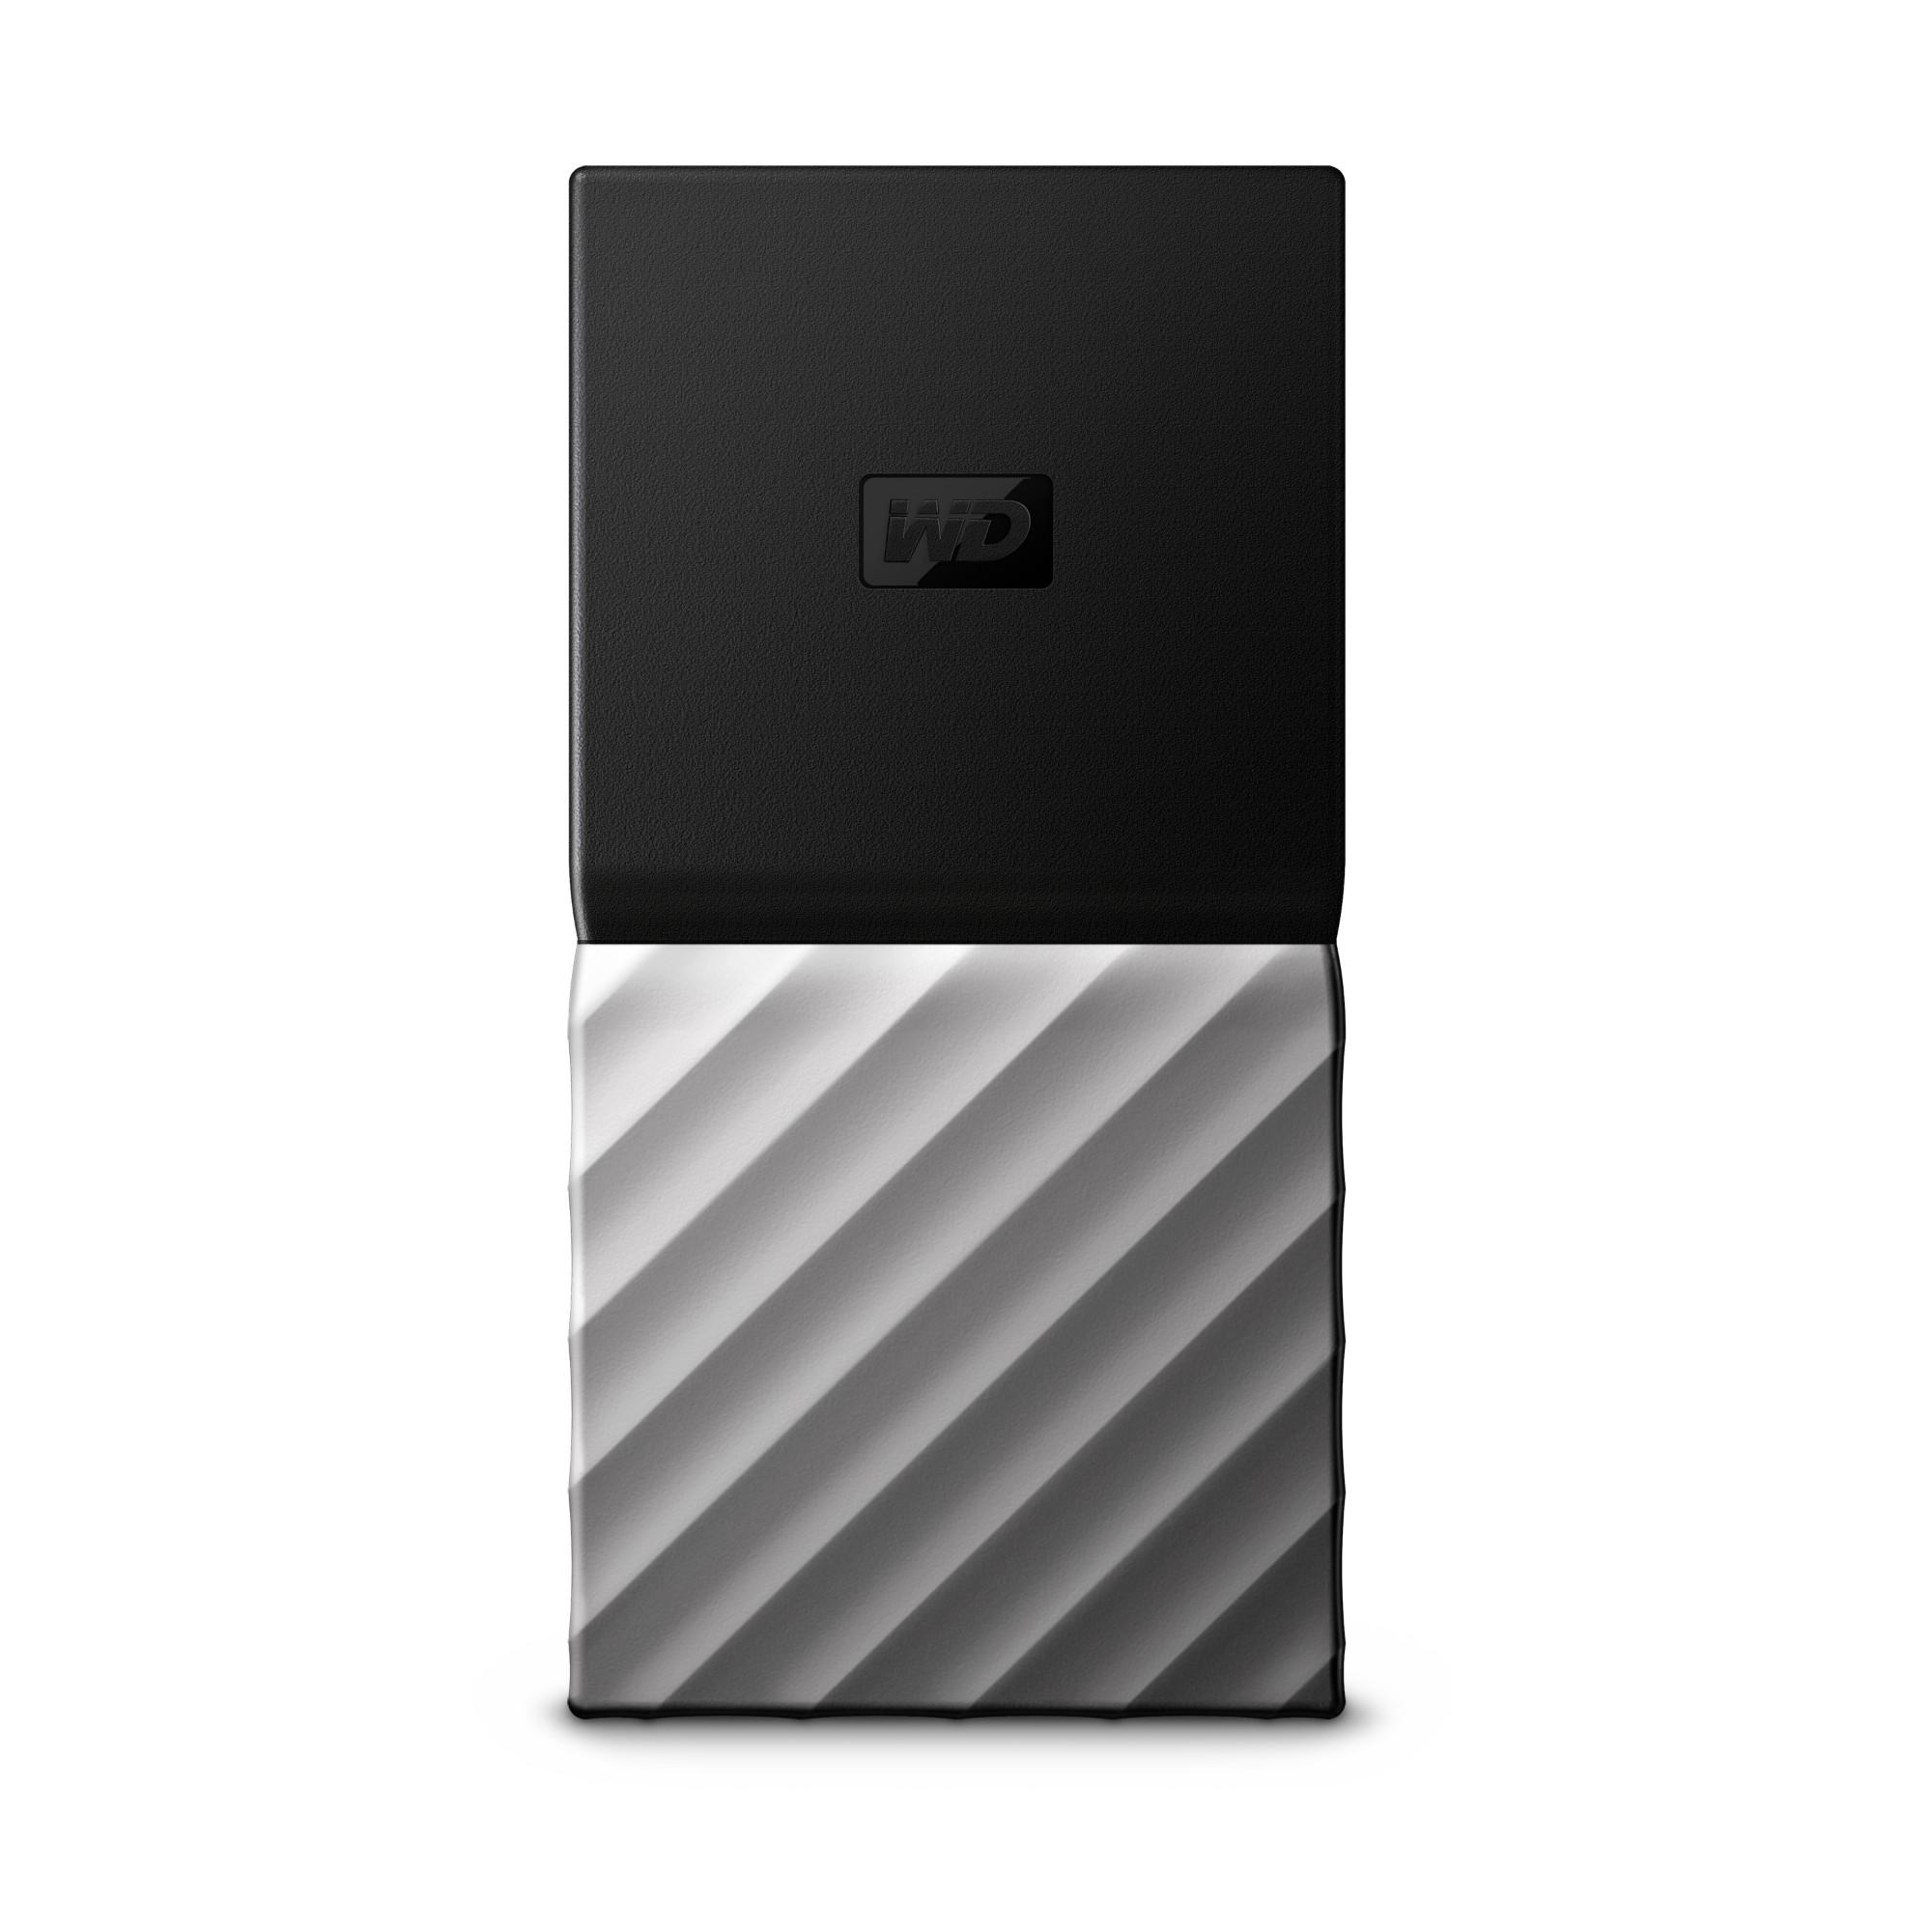 Western Digital My Passport 1000 GB Black,Silver